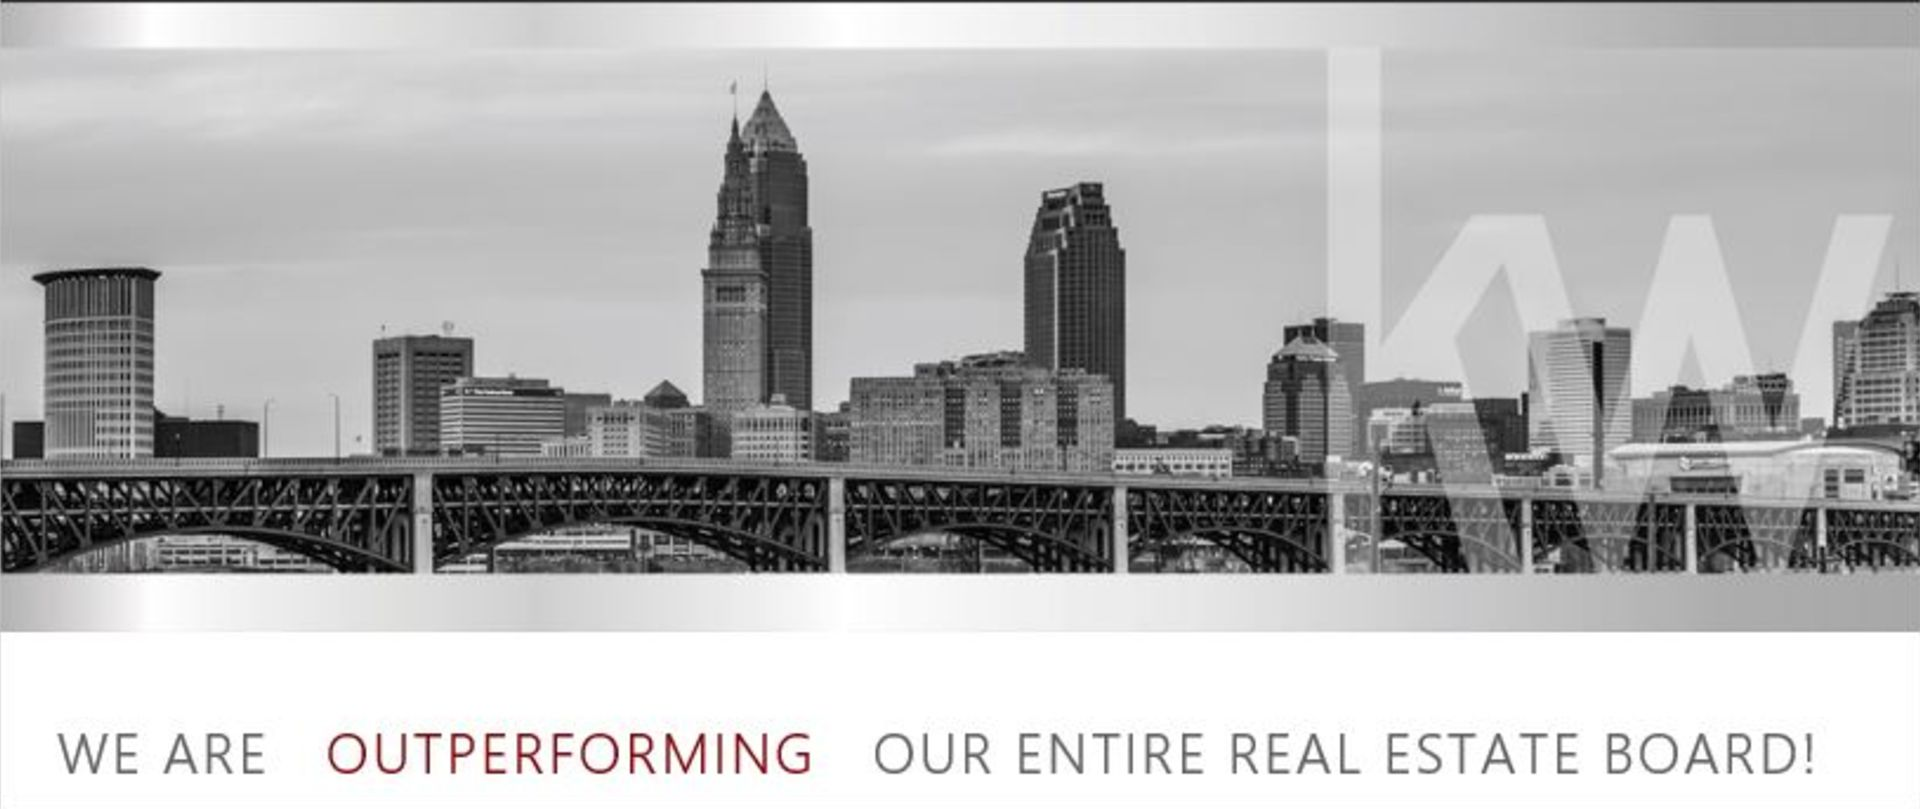 Keller Williams Leads the Cleveland Real Estate Market